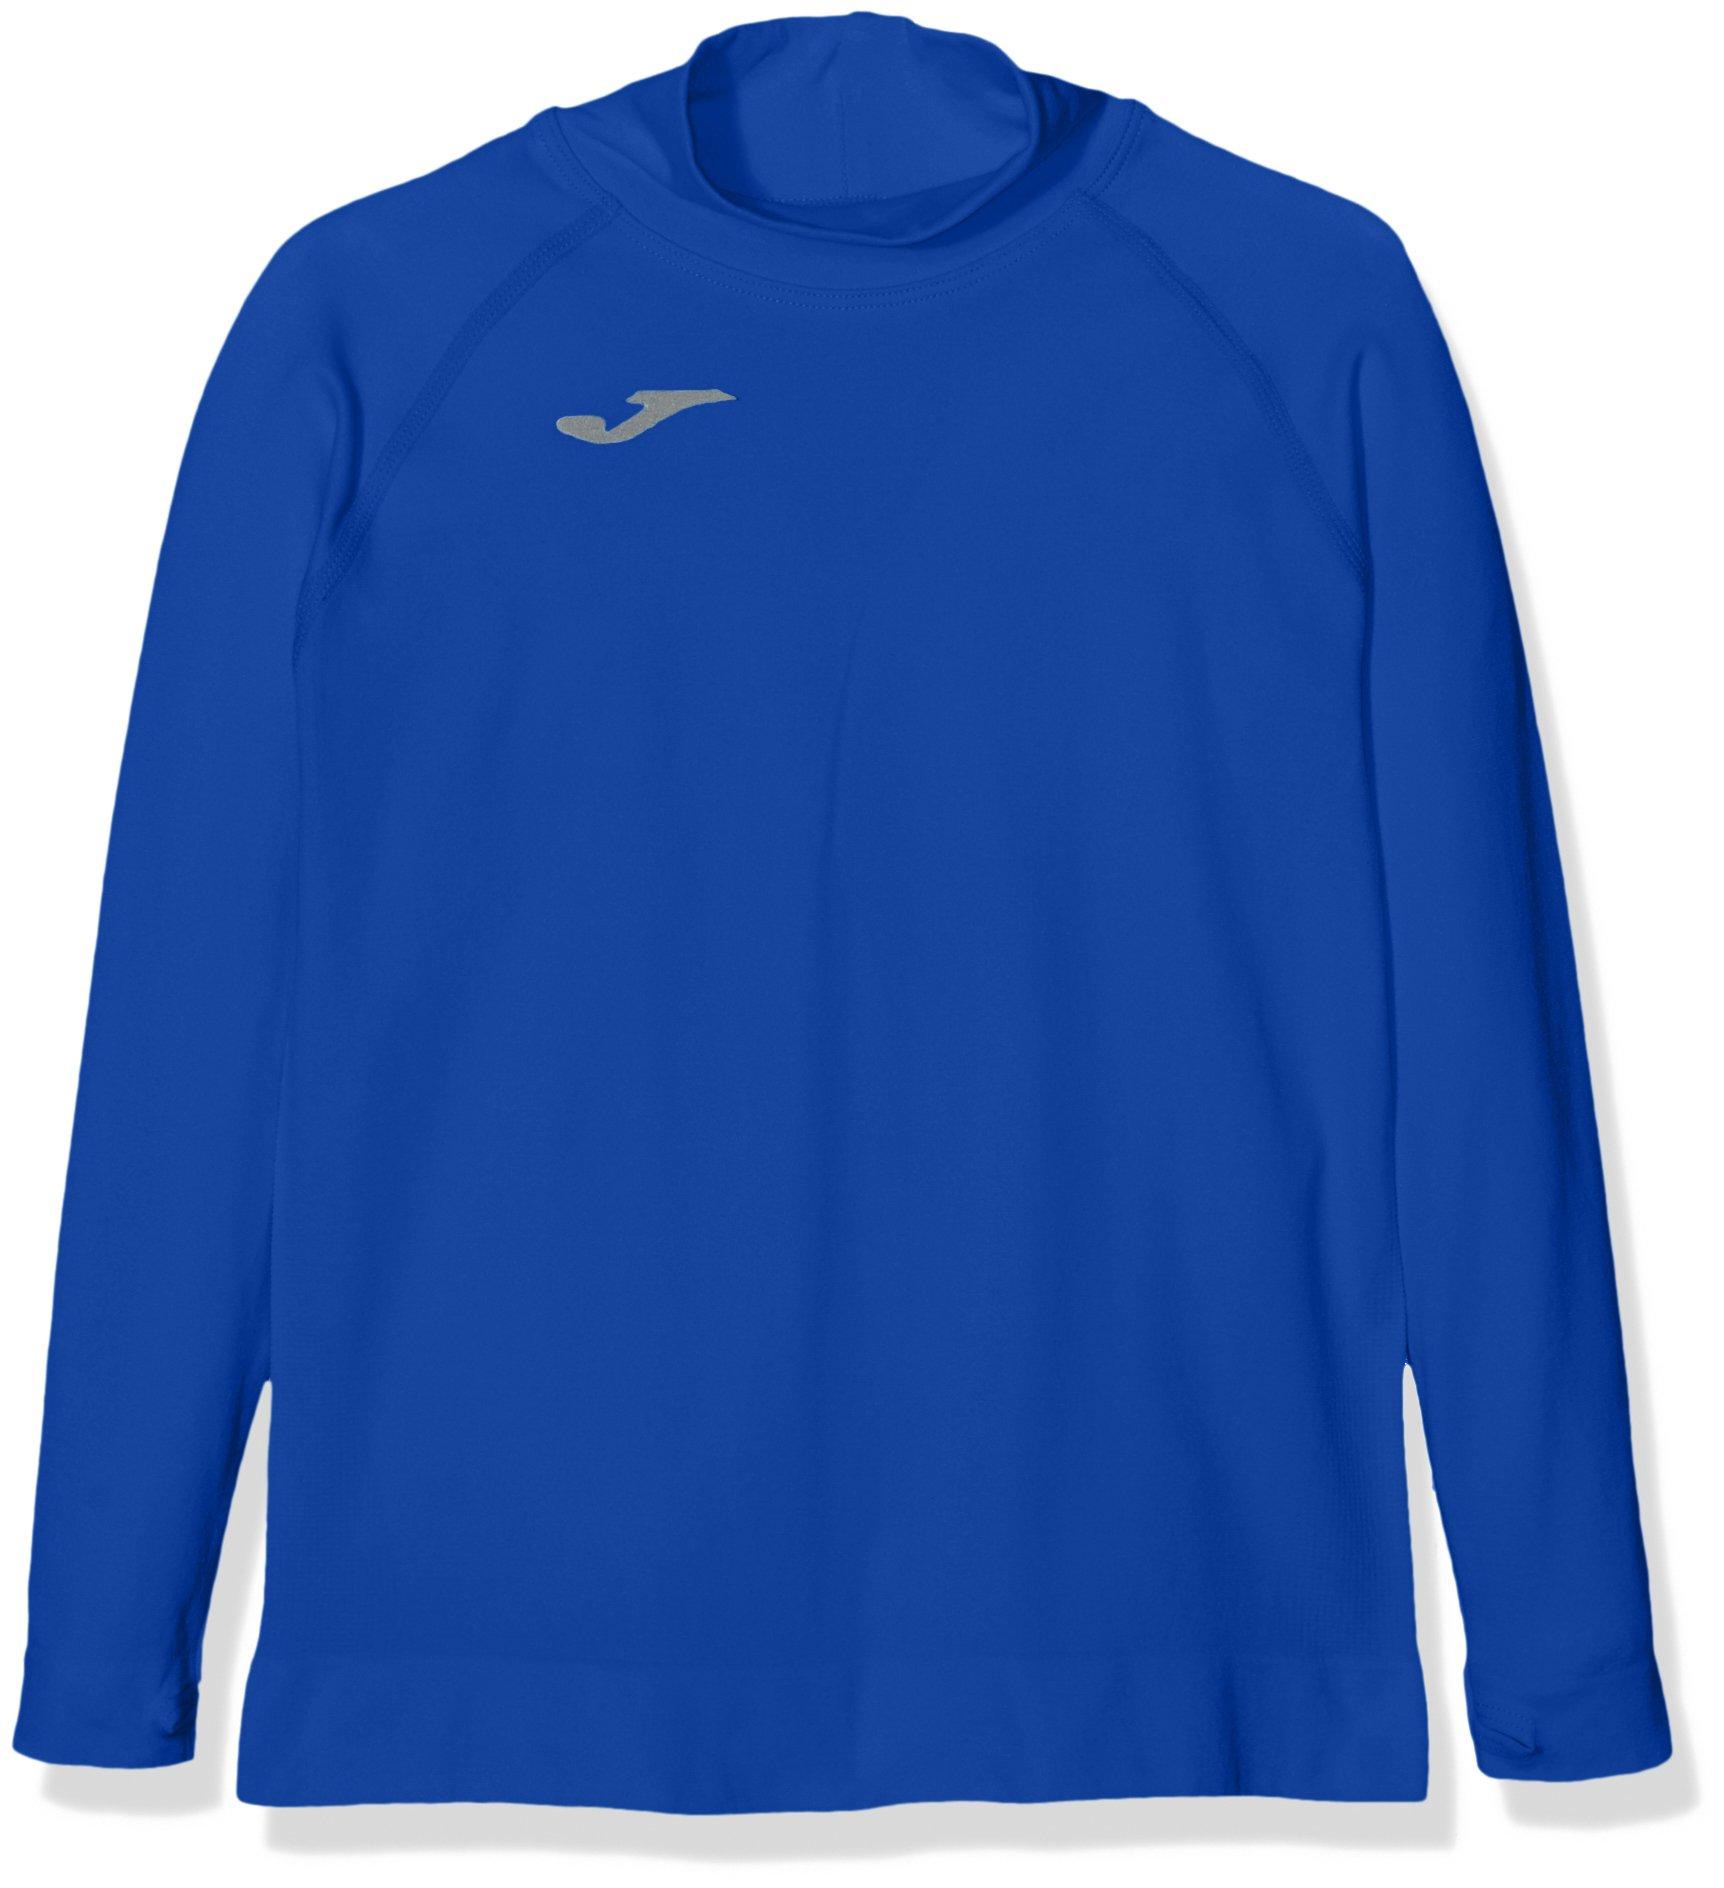 Joma Brama Classic - Camiseta térmica para niños, color azul royal, talla 4-